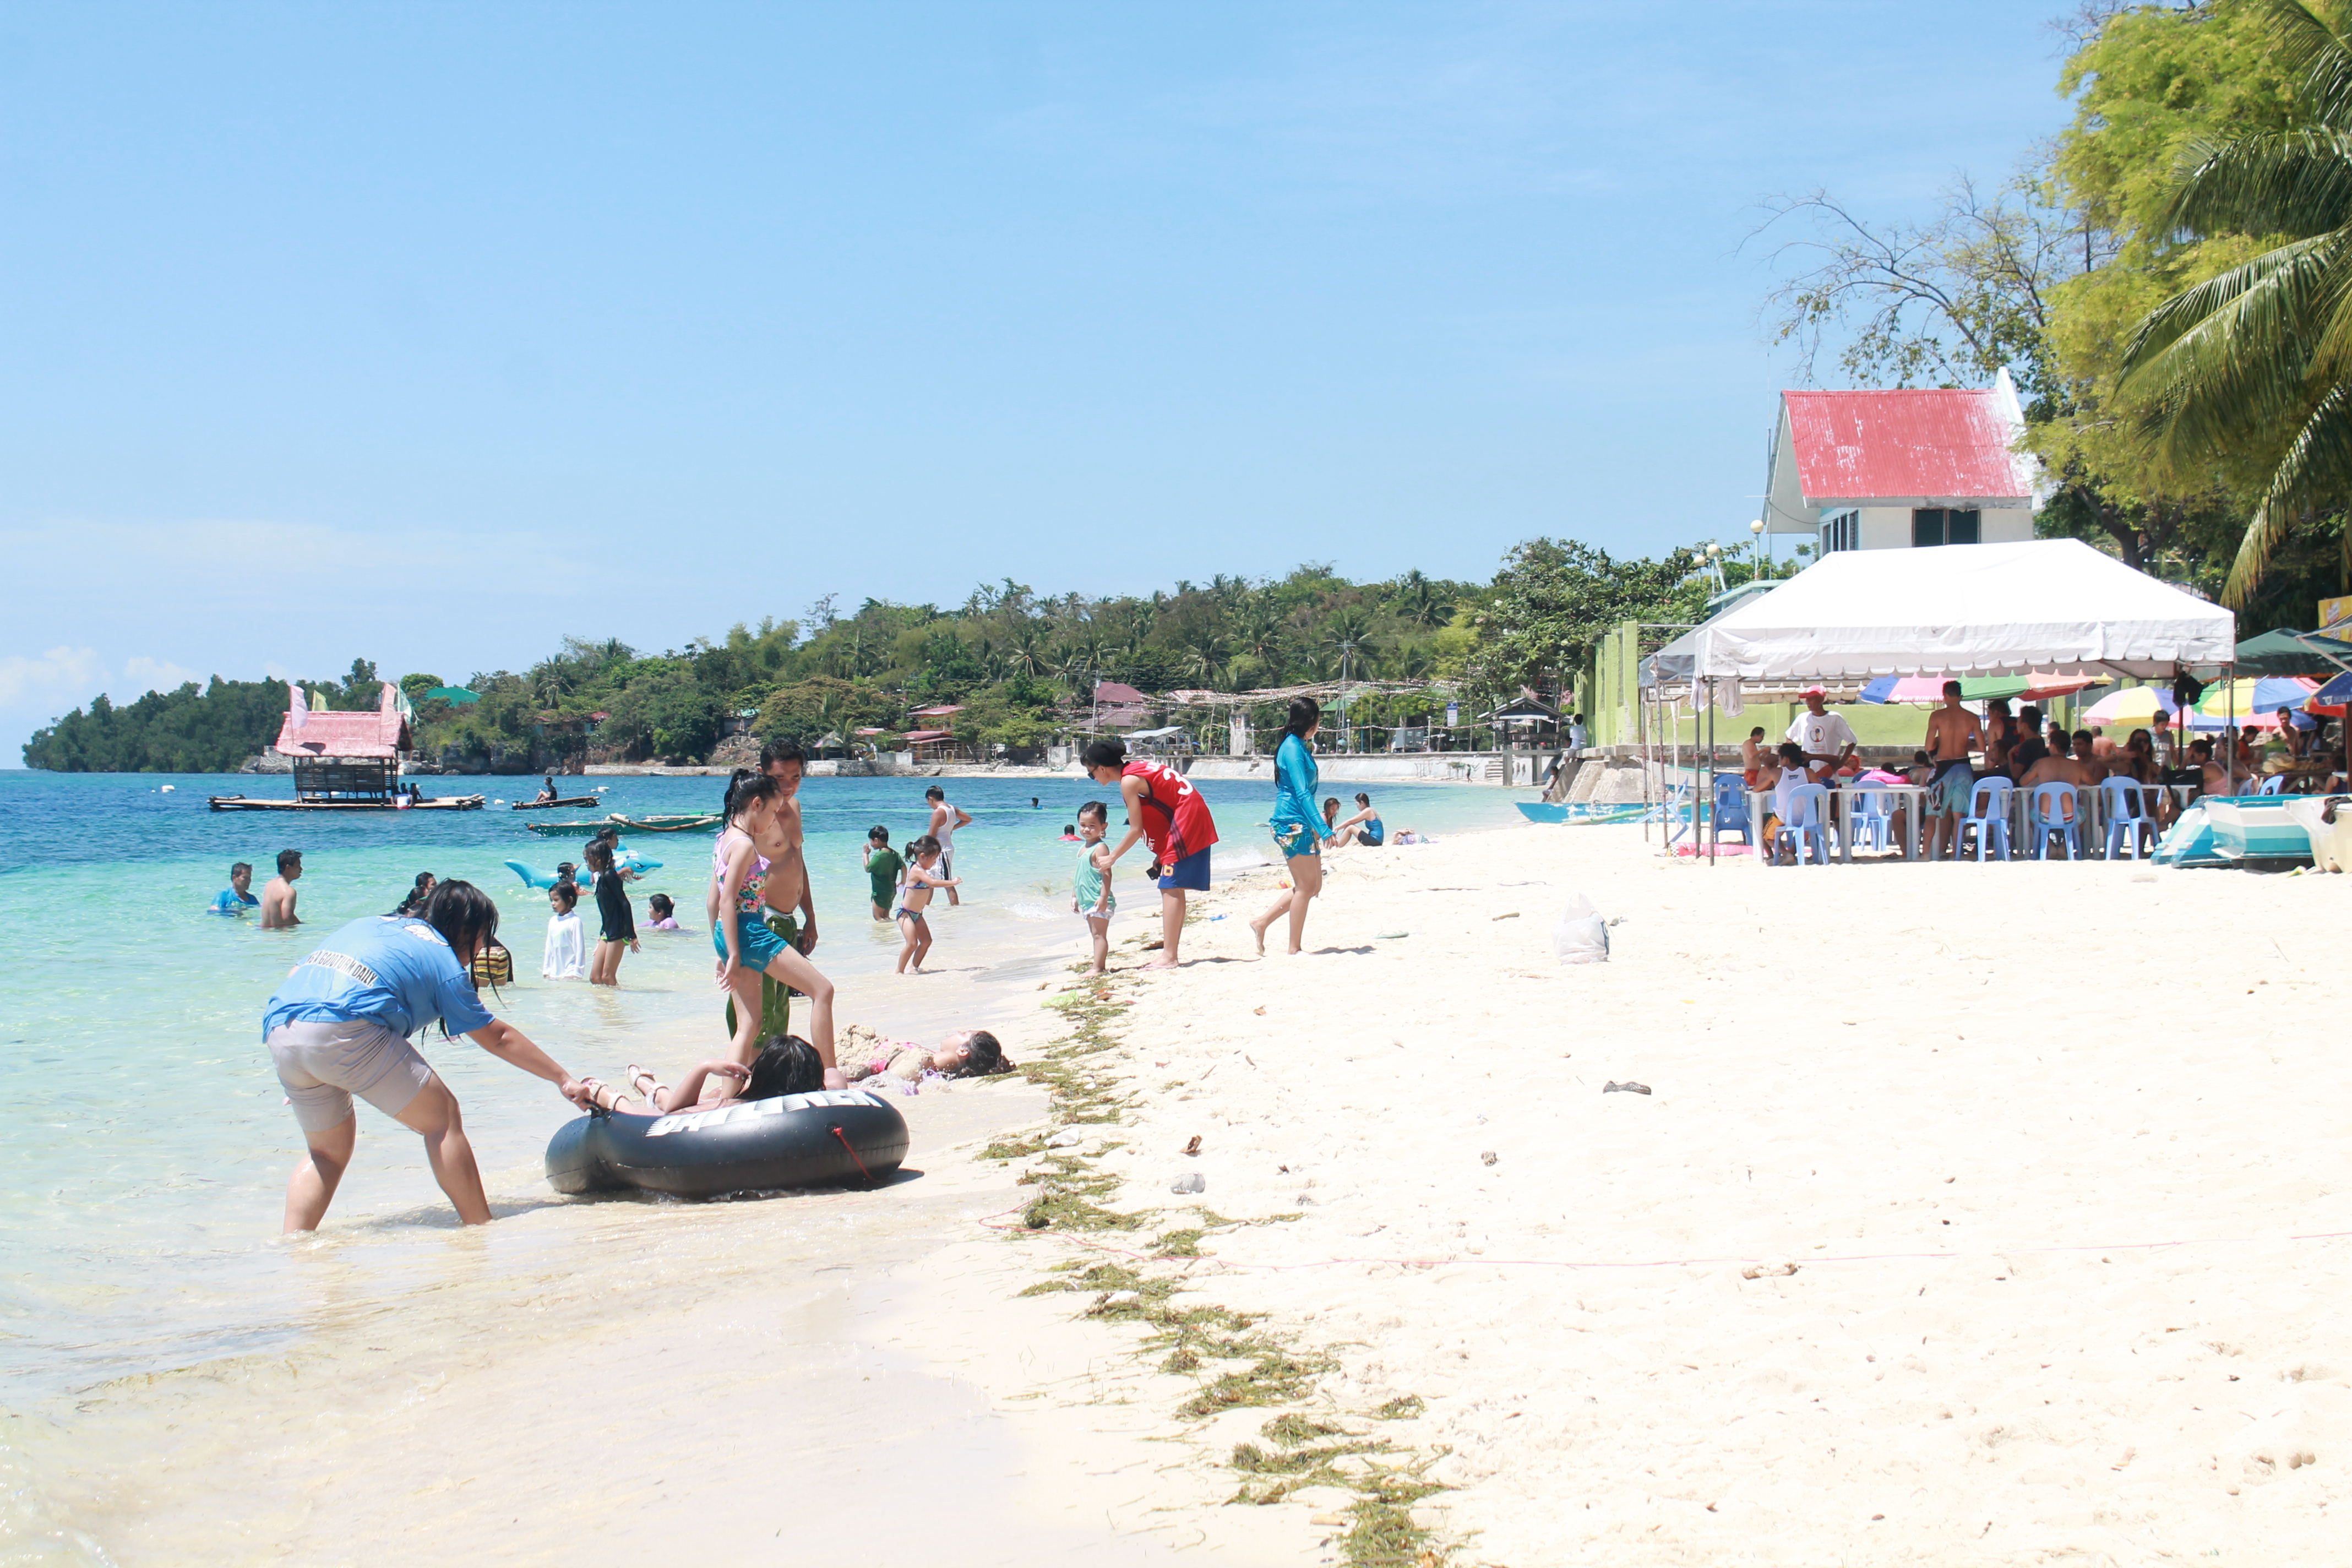 Alcoy (Cebu) Philippines  city photos gallery : Alcoy, Cebu: A Labor's Day Treat | doreen the explorer